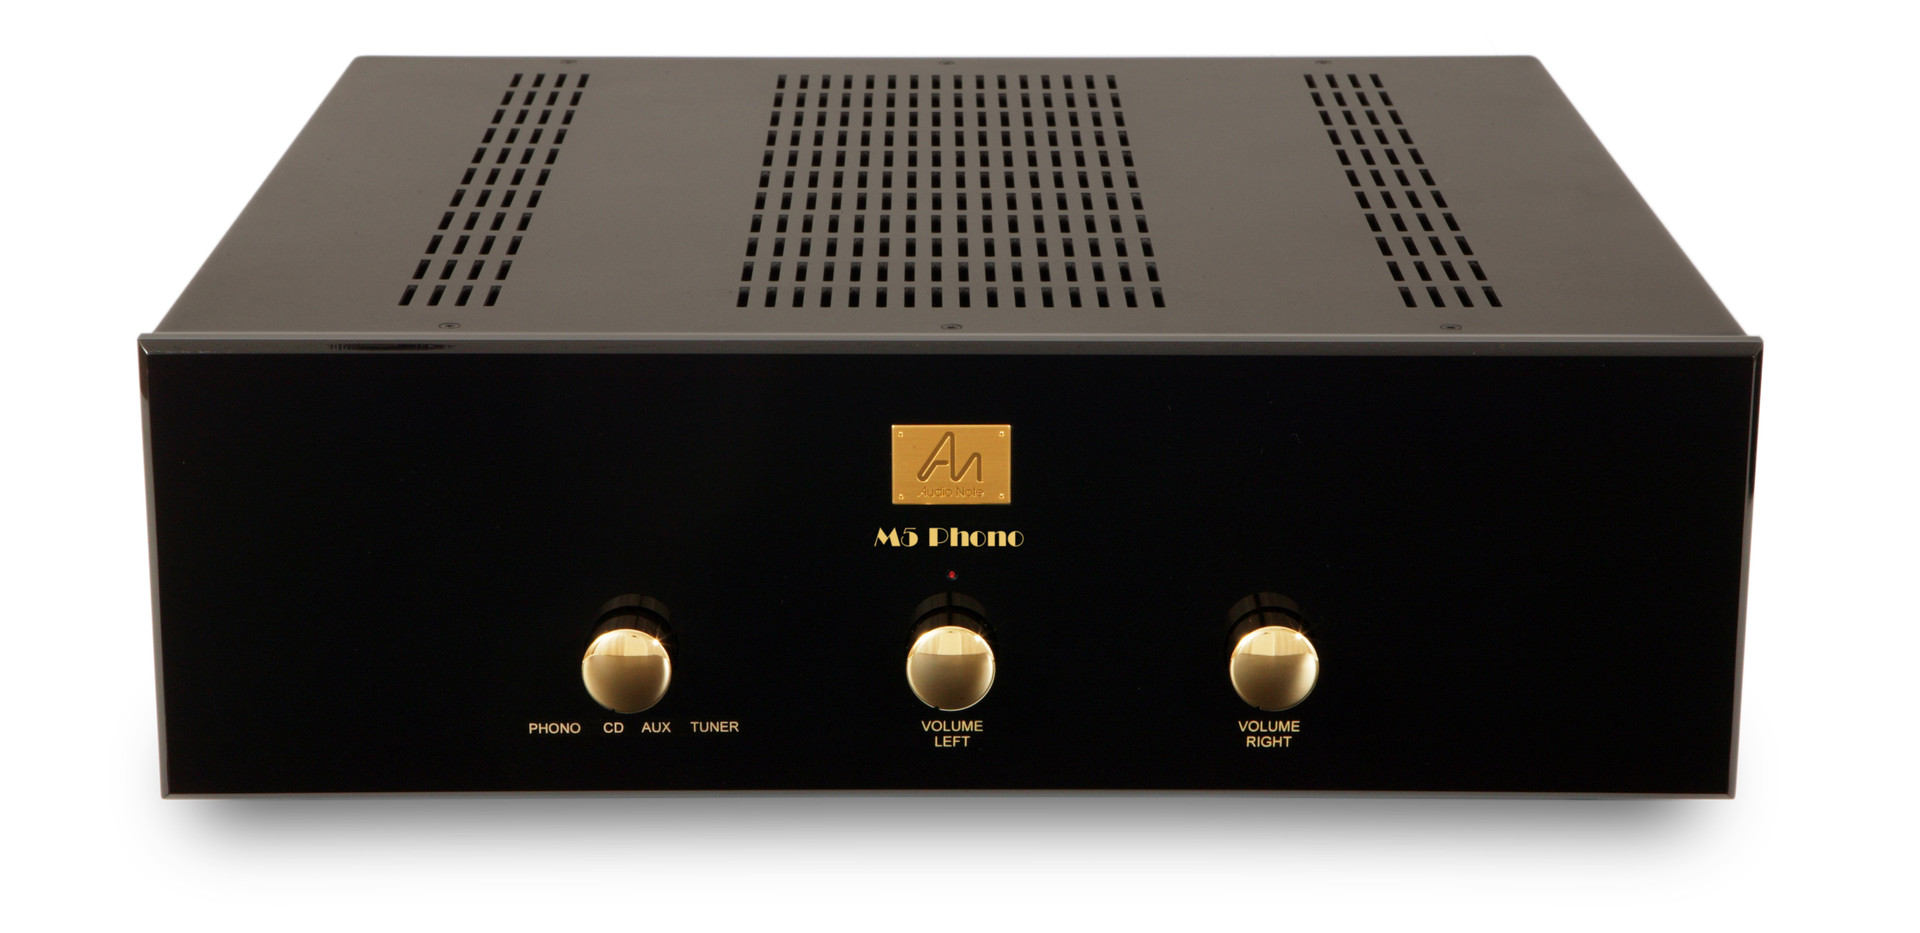 M5 Phono front top 1.jpg